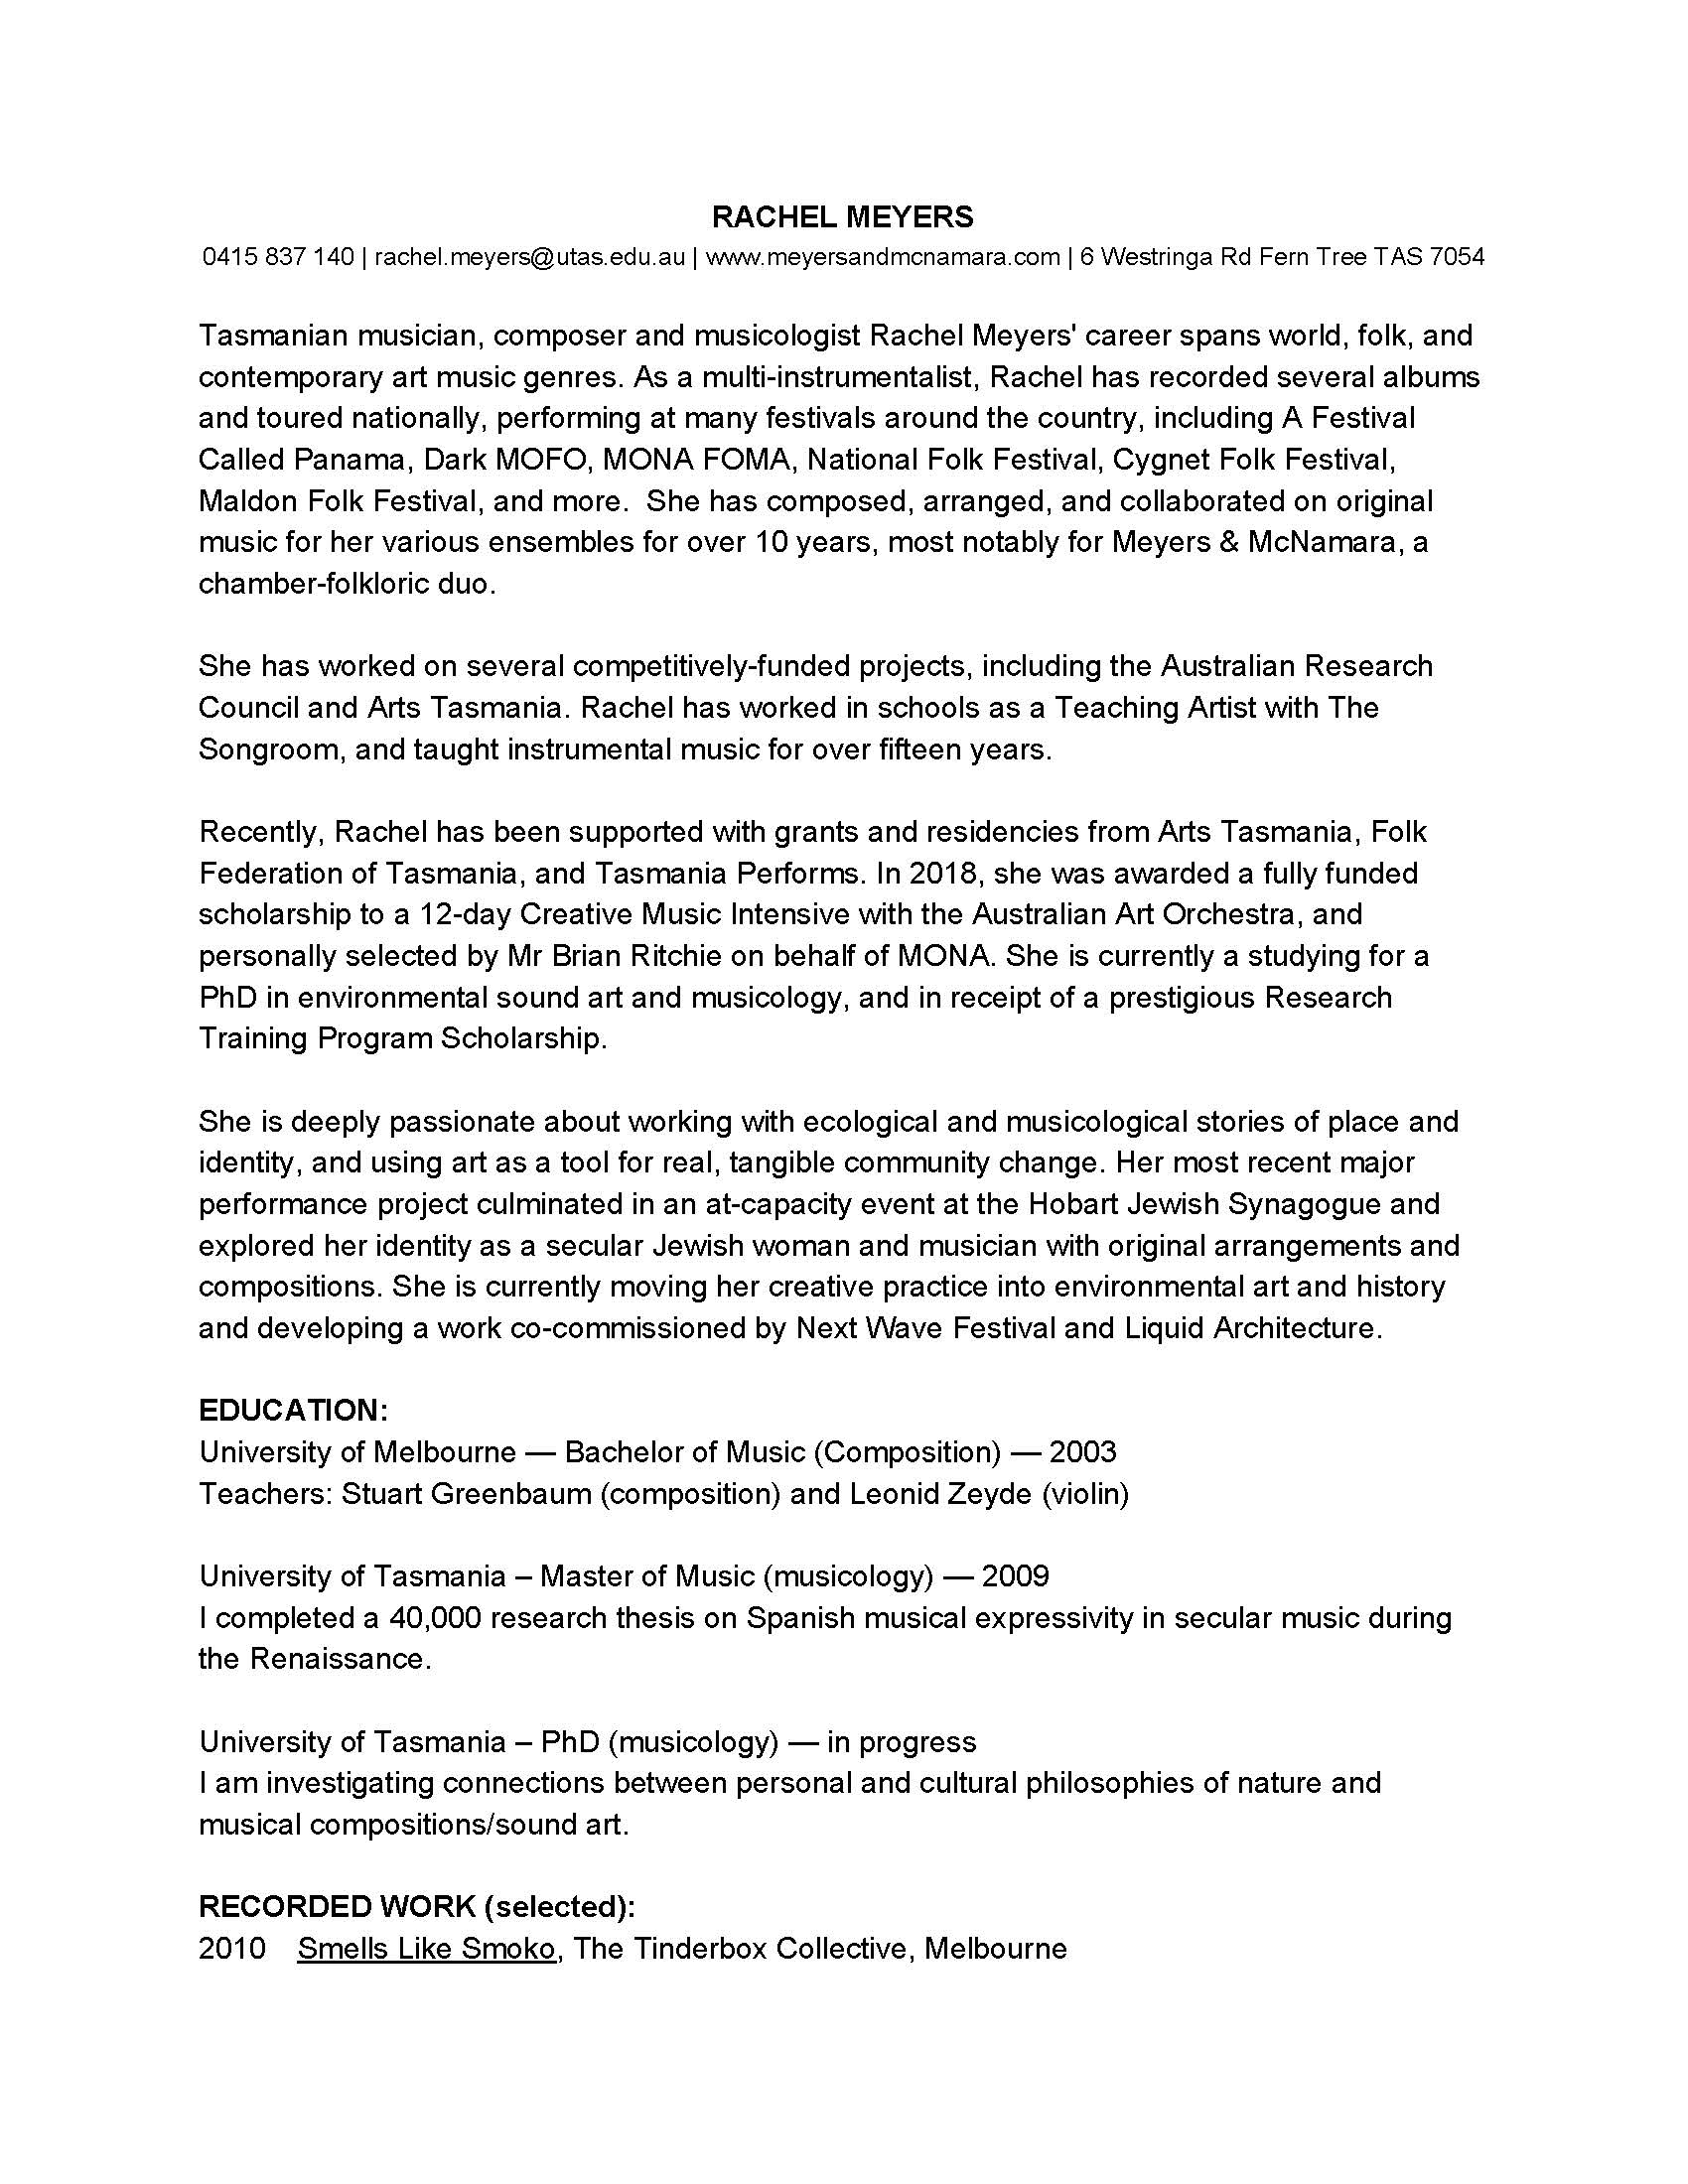 Rachel Meyers short bio (1)_Page_1.jpg